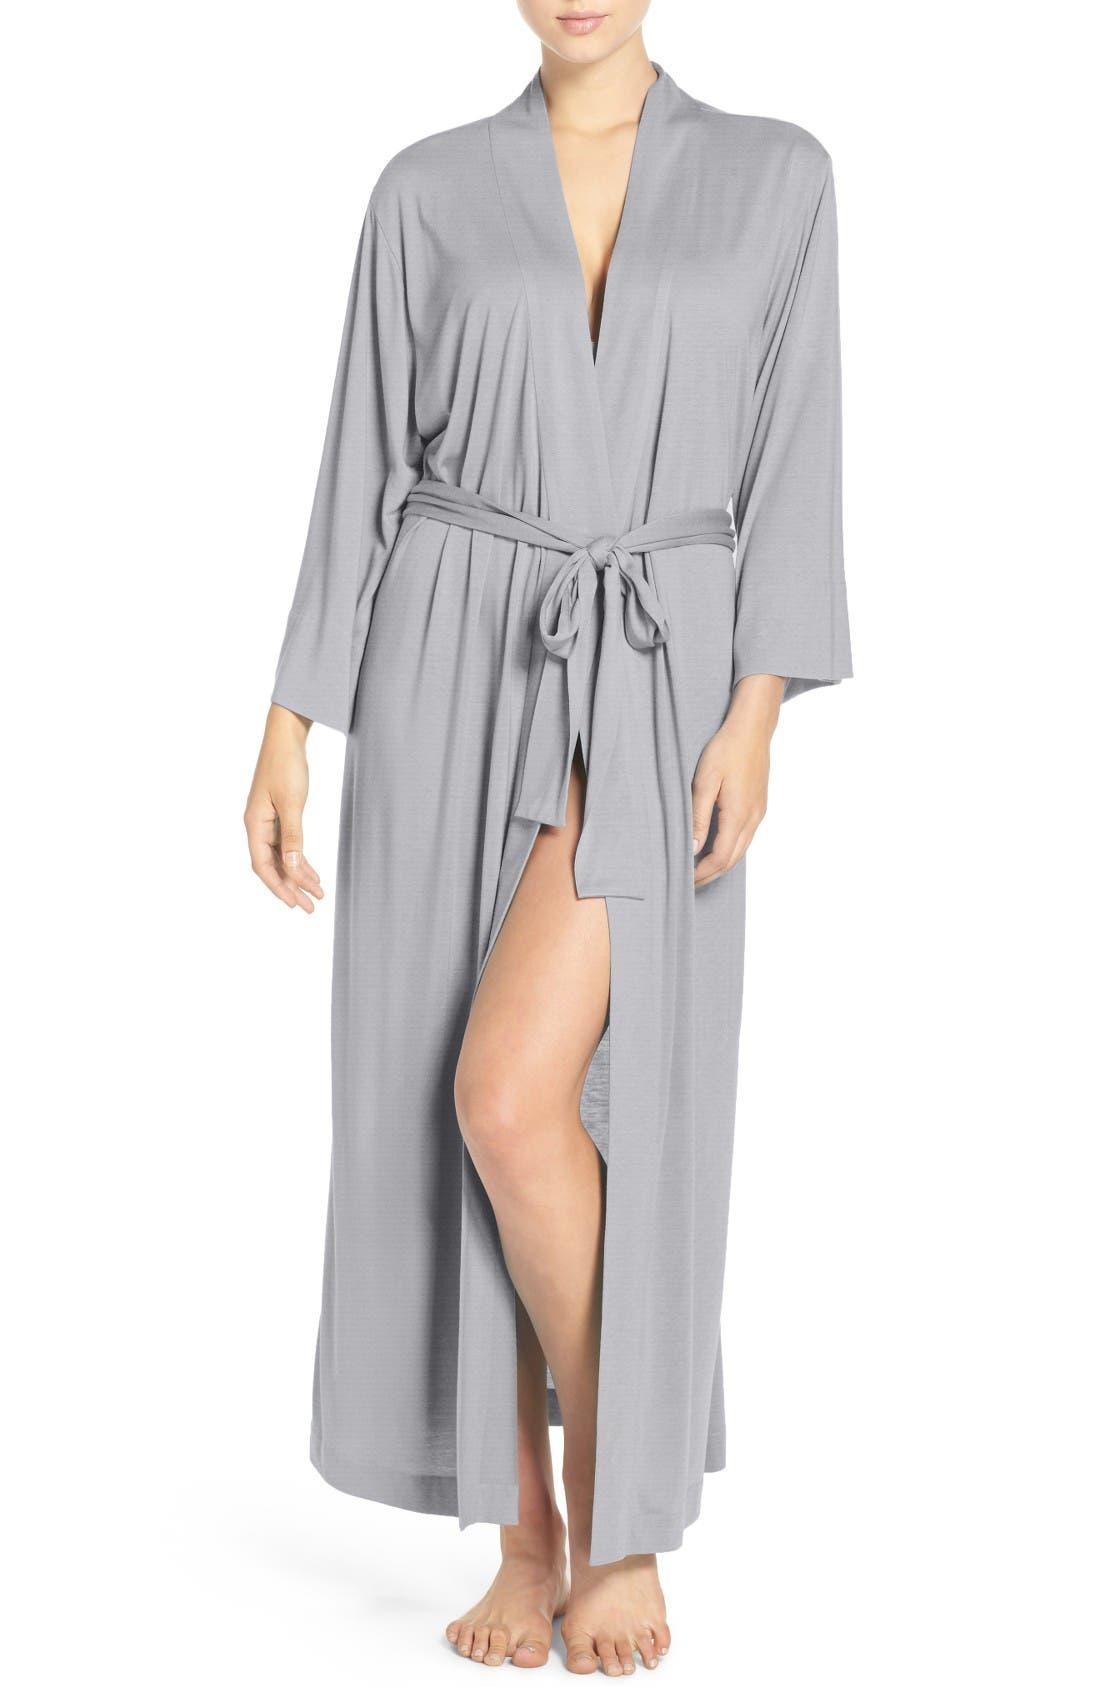 NATORI 'Shangri-La' Robe, Main, color, HEATHER GREY